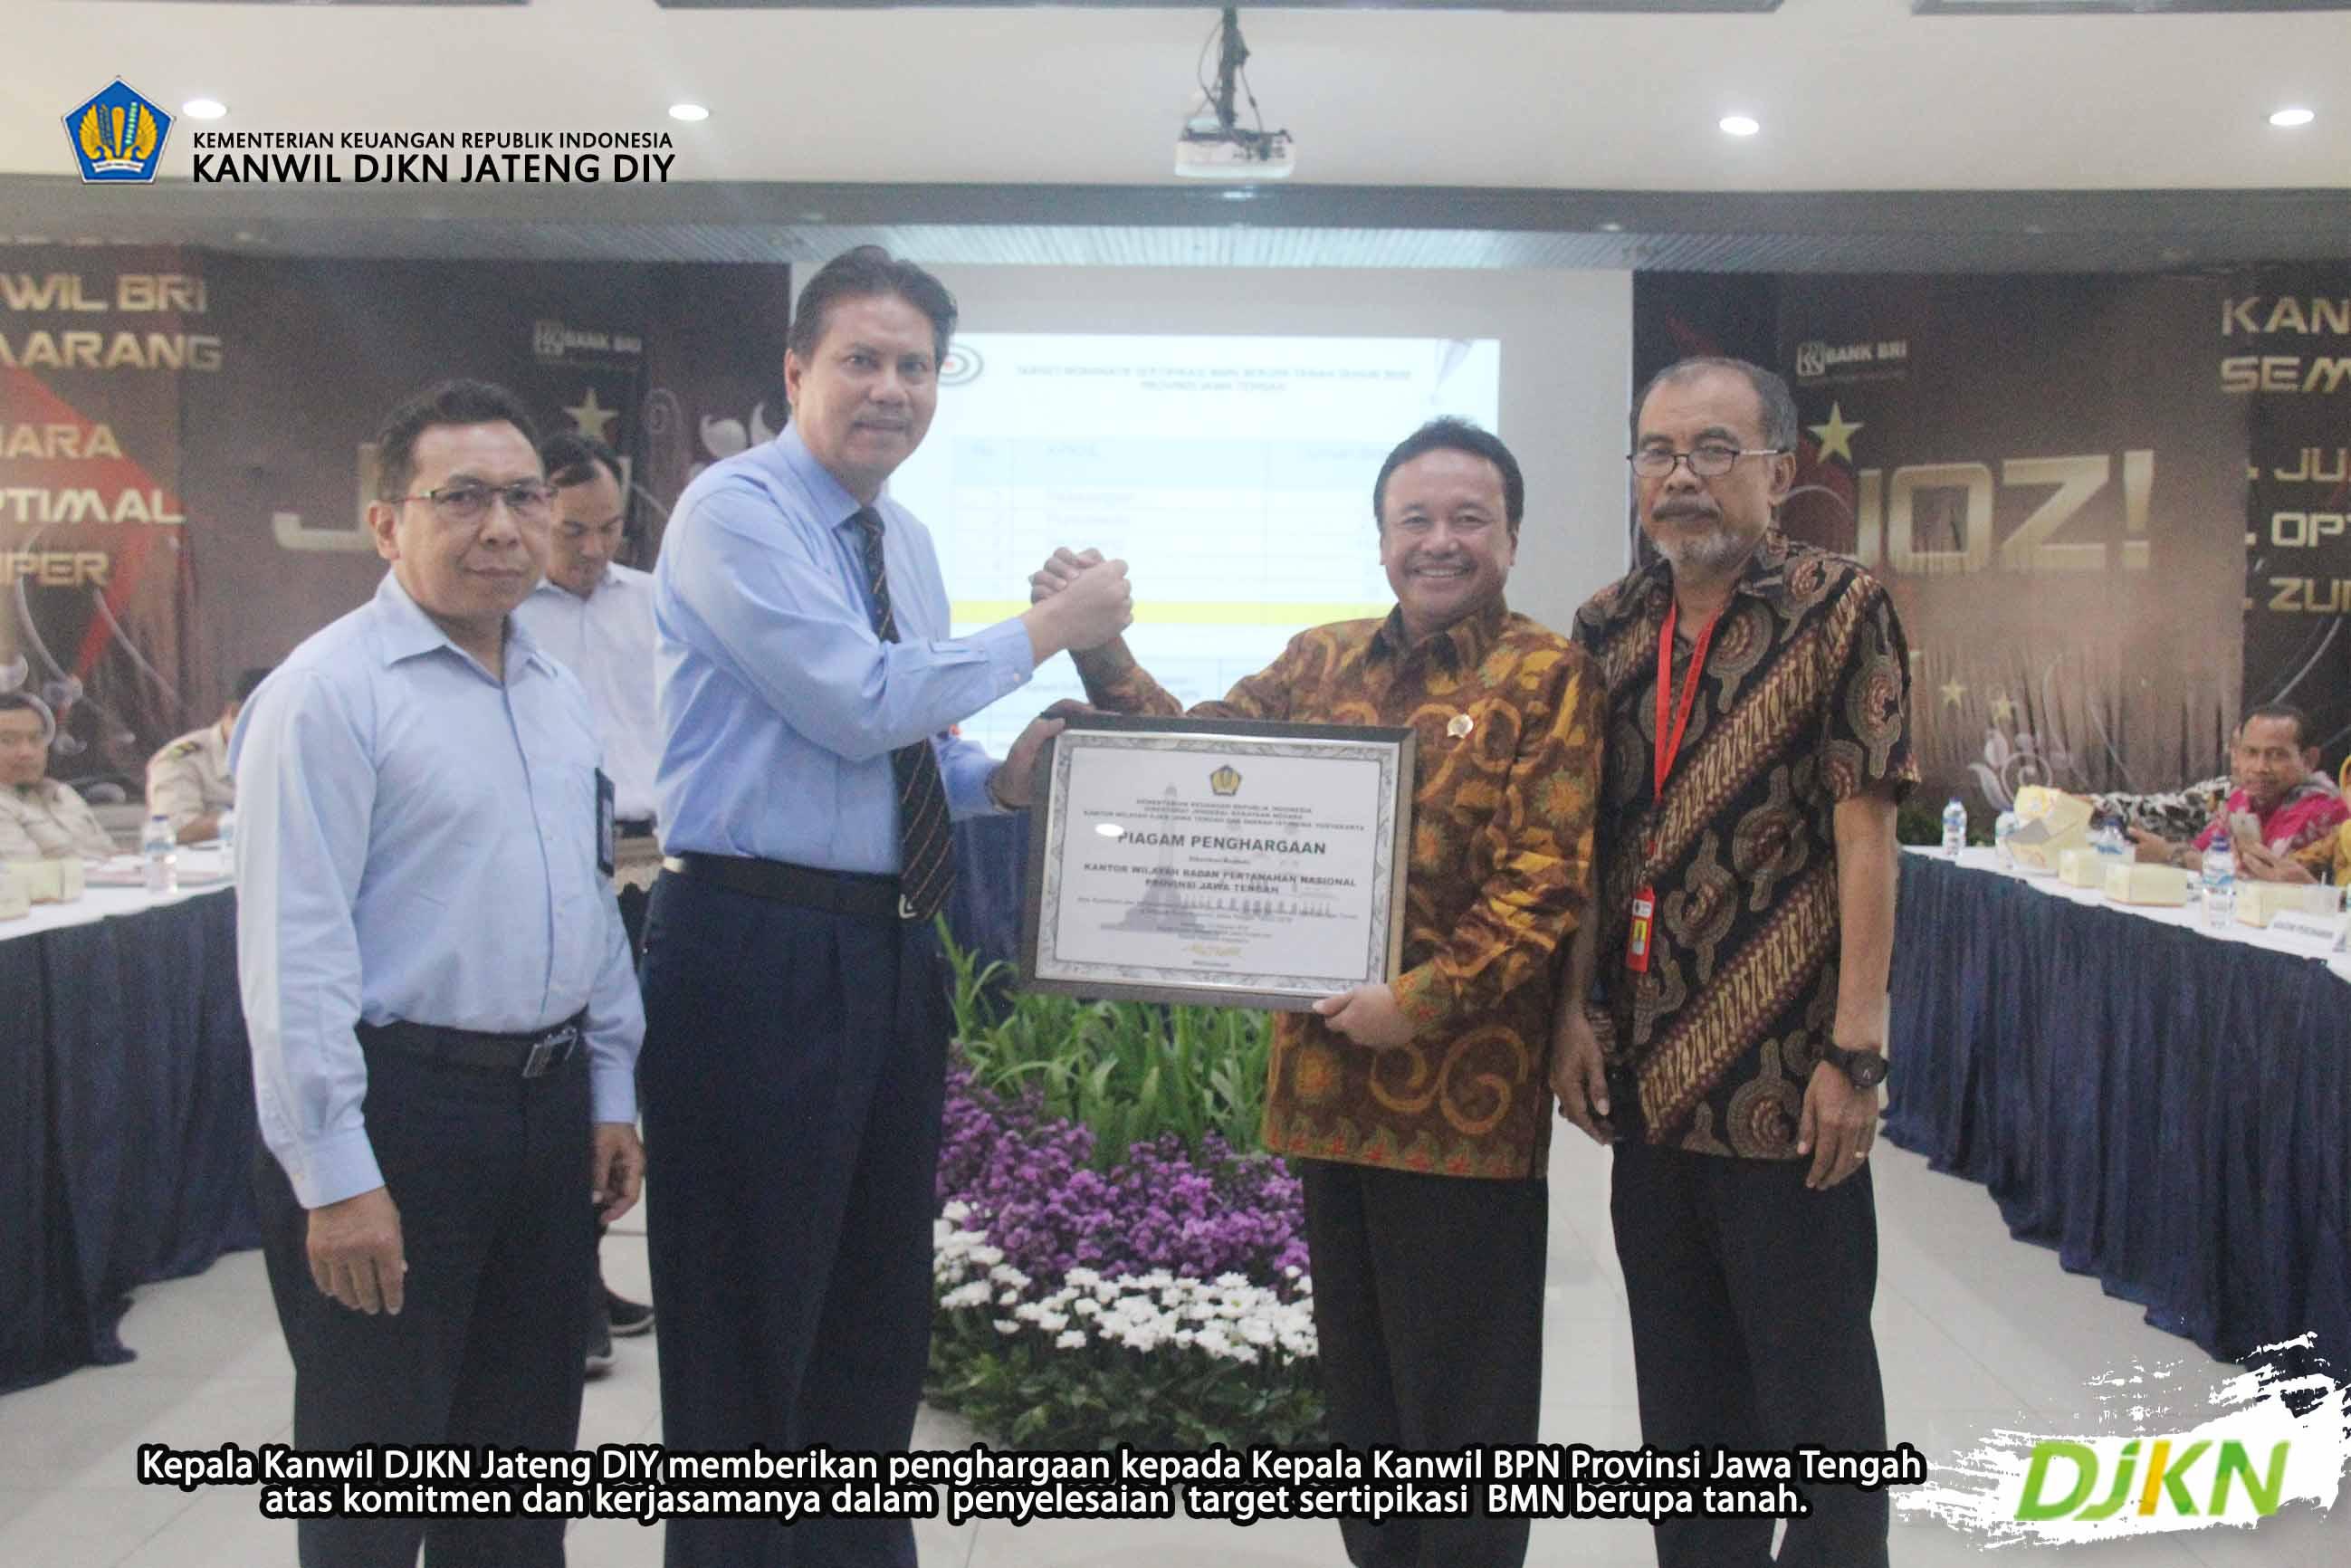 Gelar Rapat Monitoring Program Sertipikasi BMN, Kanwil DJKN Jateng DIY Berikan Apresiasi kepada BPN